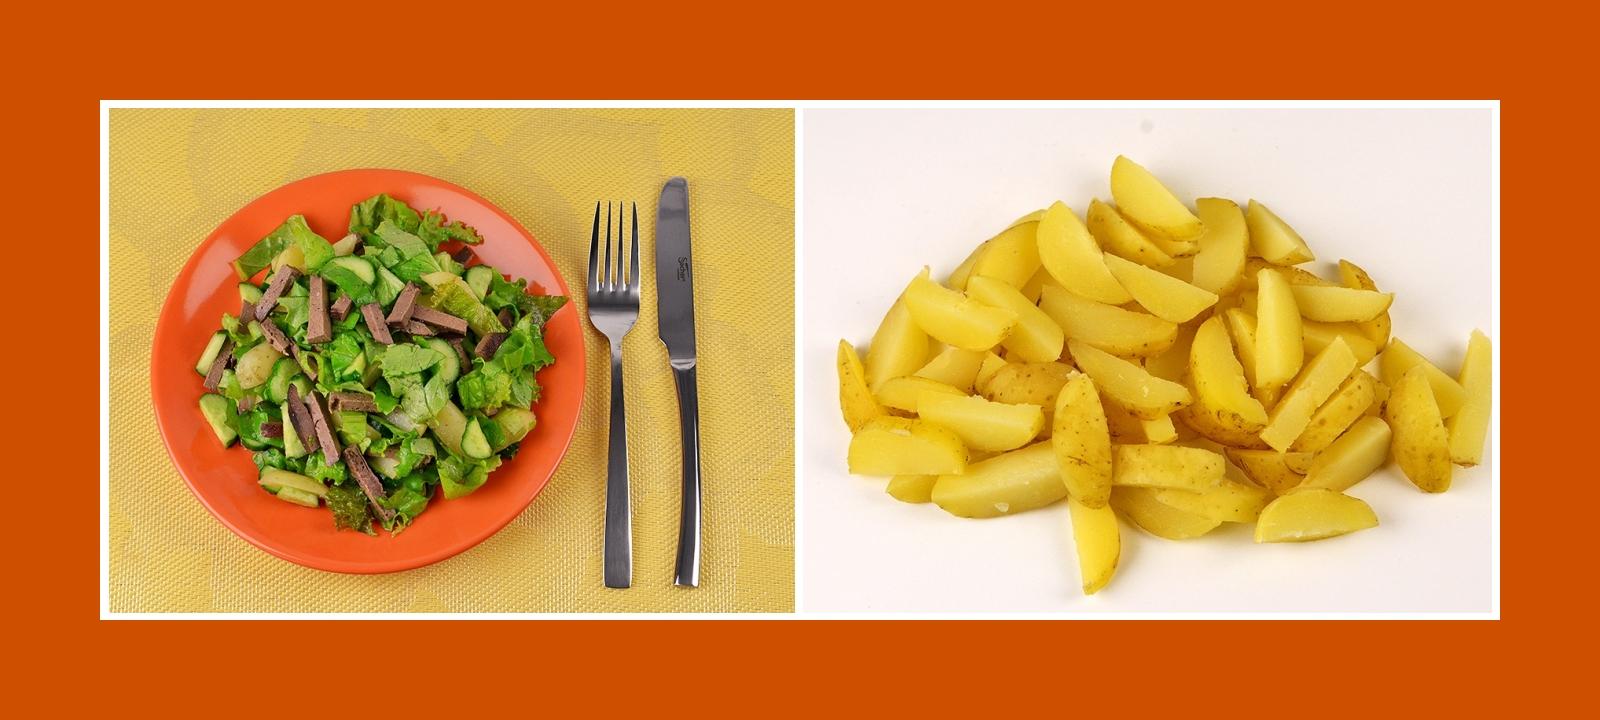 Frühkartoffeln für pikanten Gemüsesalat